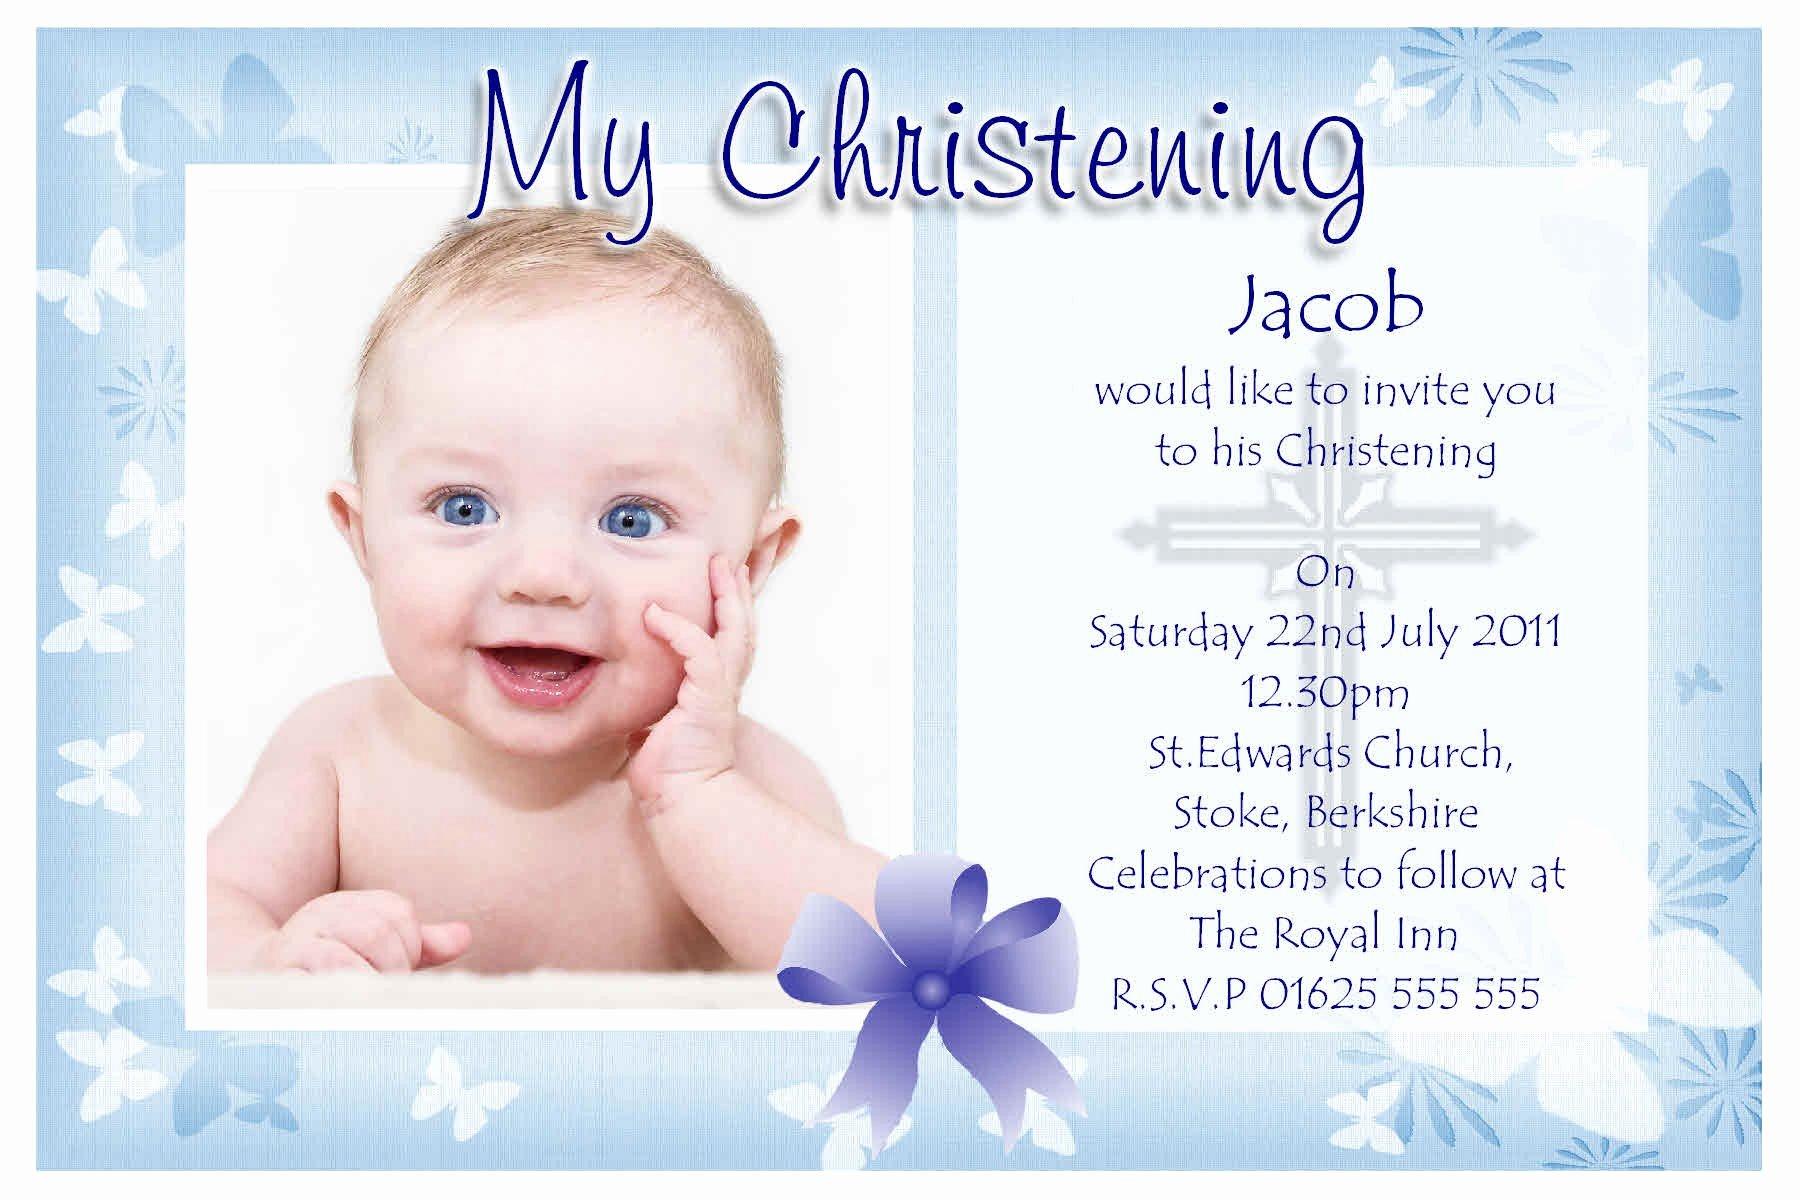 Sample Baptismal Invitations Lovely Baptism Invitations Free Baptism Invitation Template